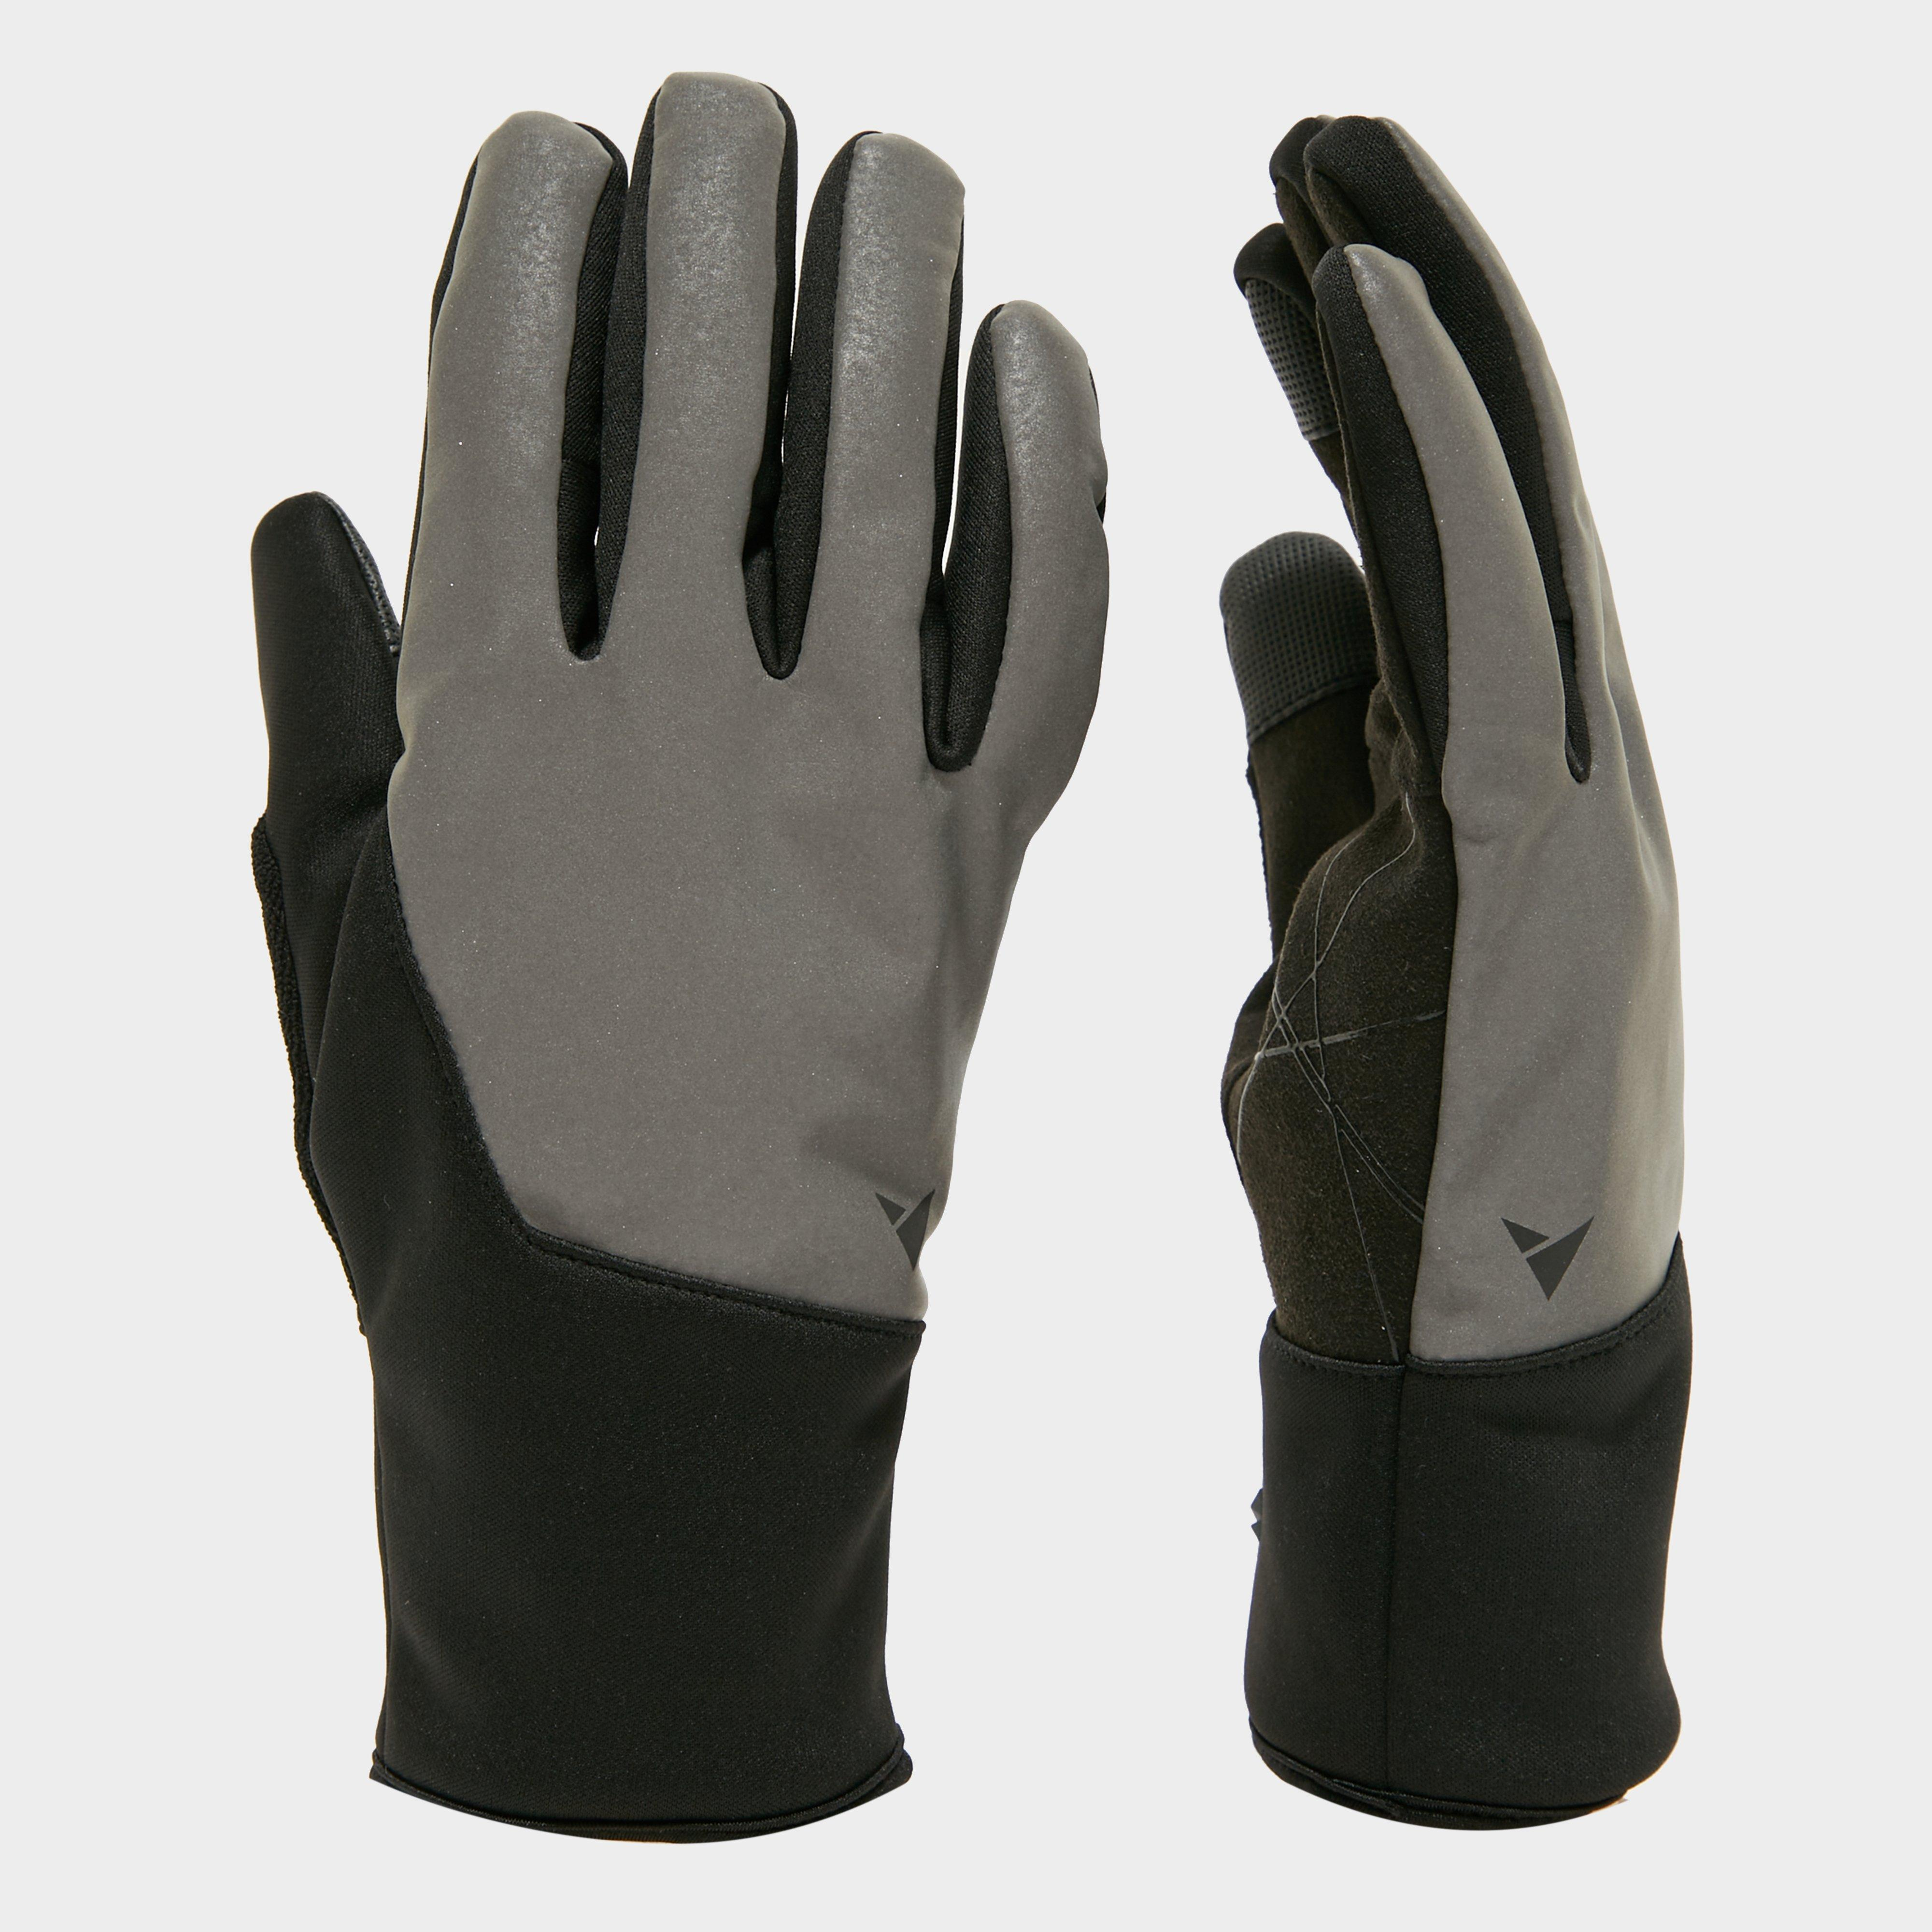 Berghaus Air 8 Tent Footprint - Grey  Grey